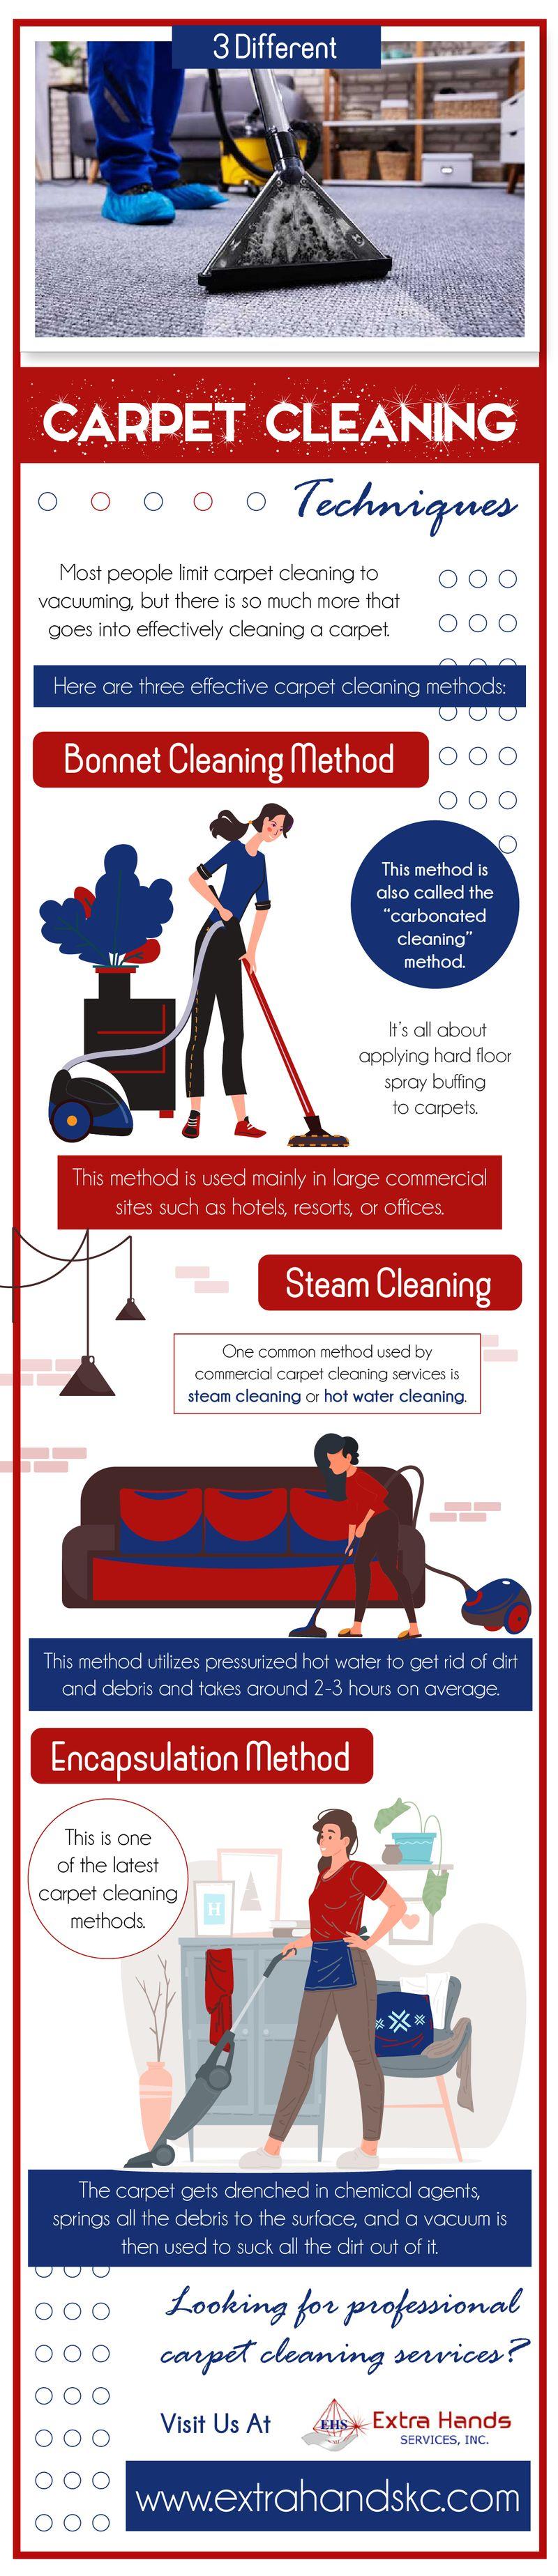 3 Different Carpet Cleaning Techniques